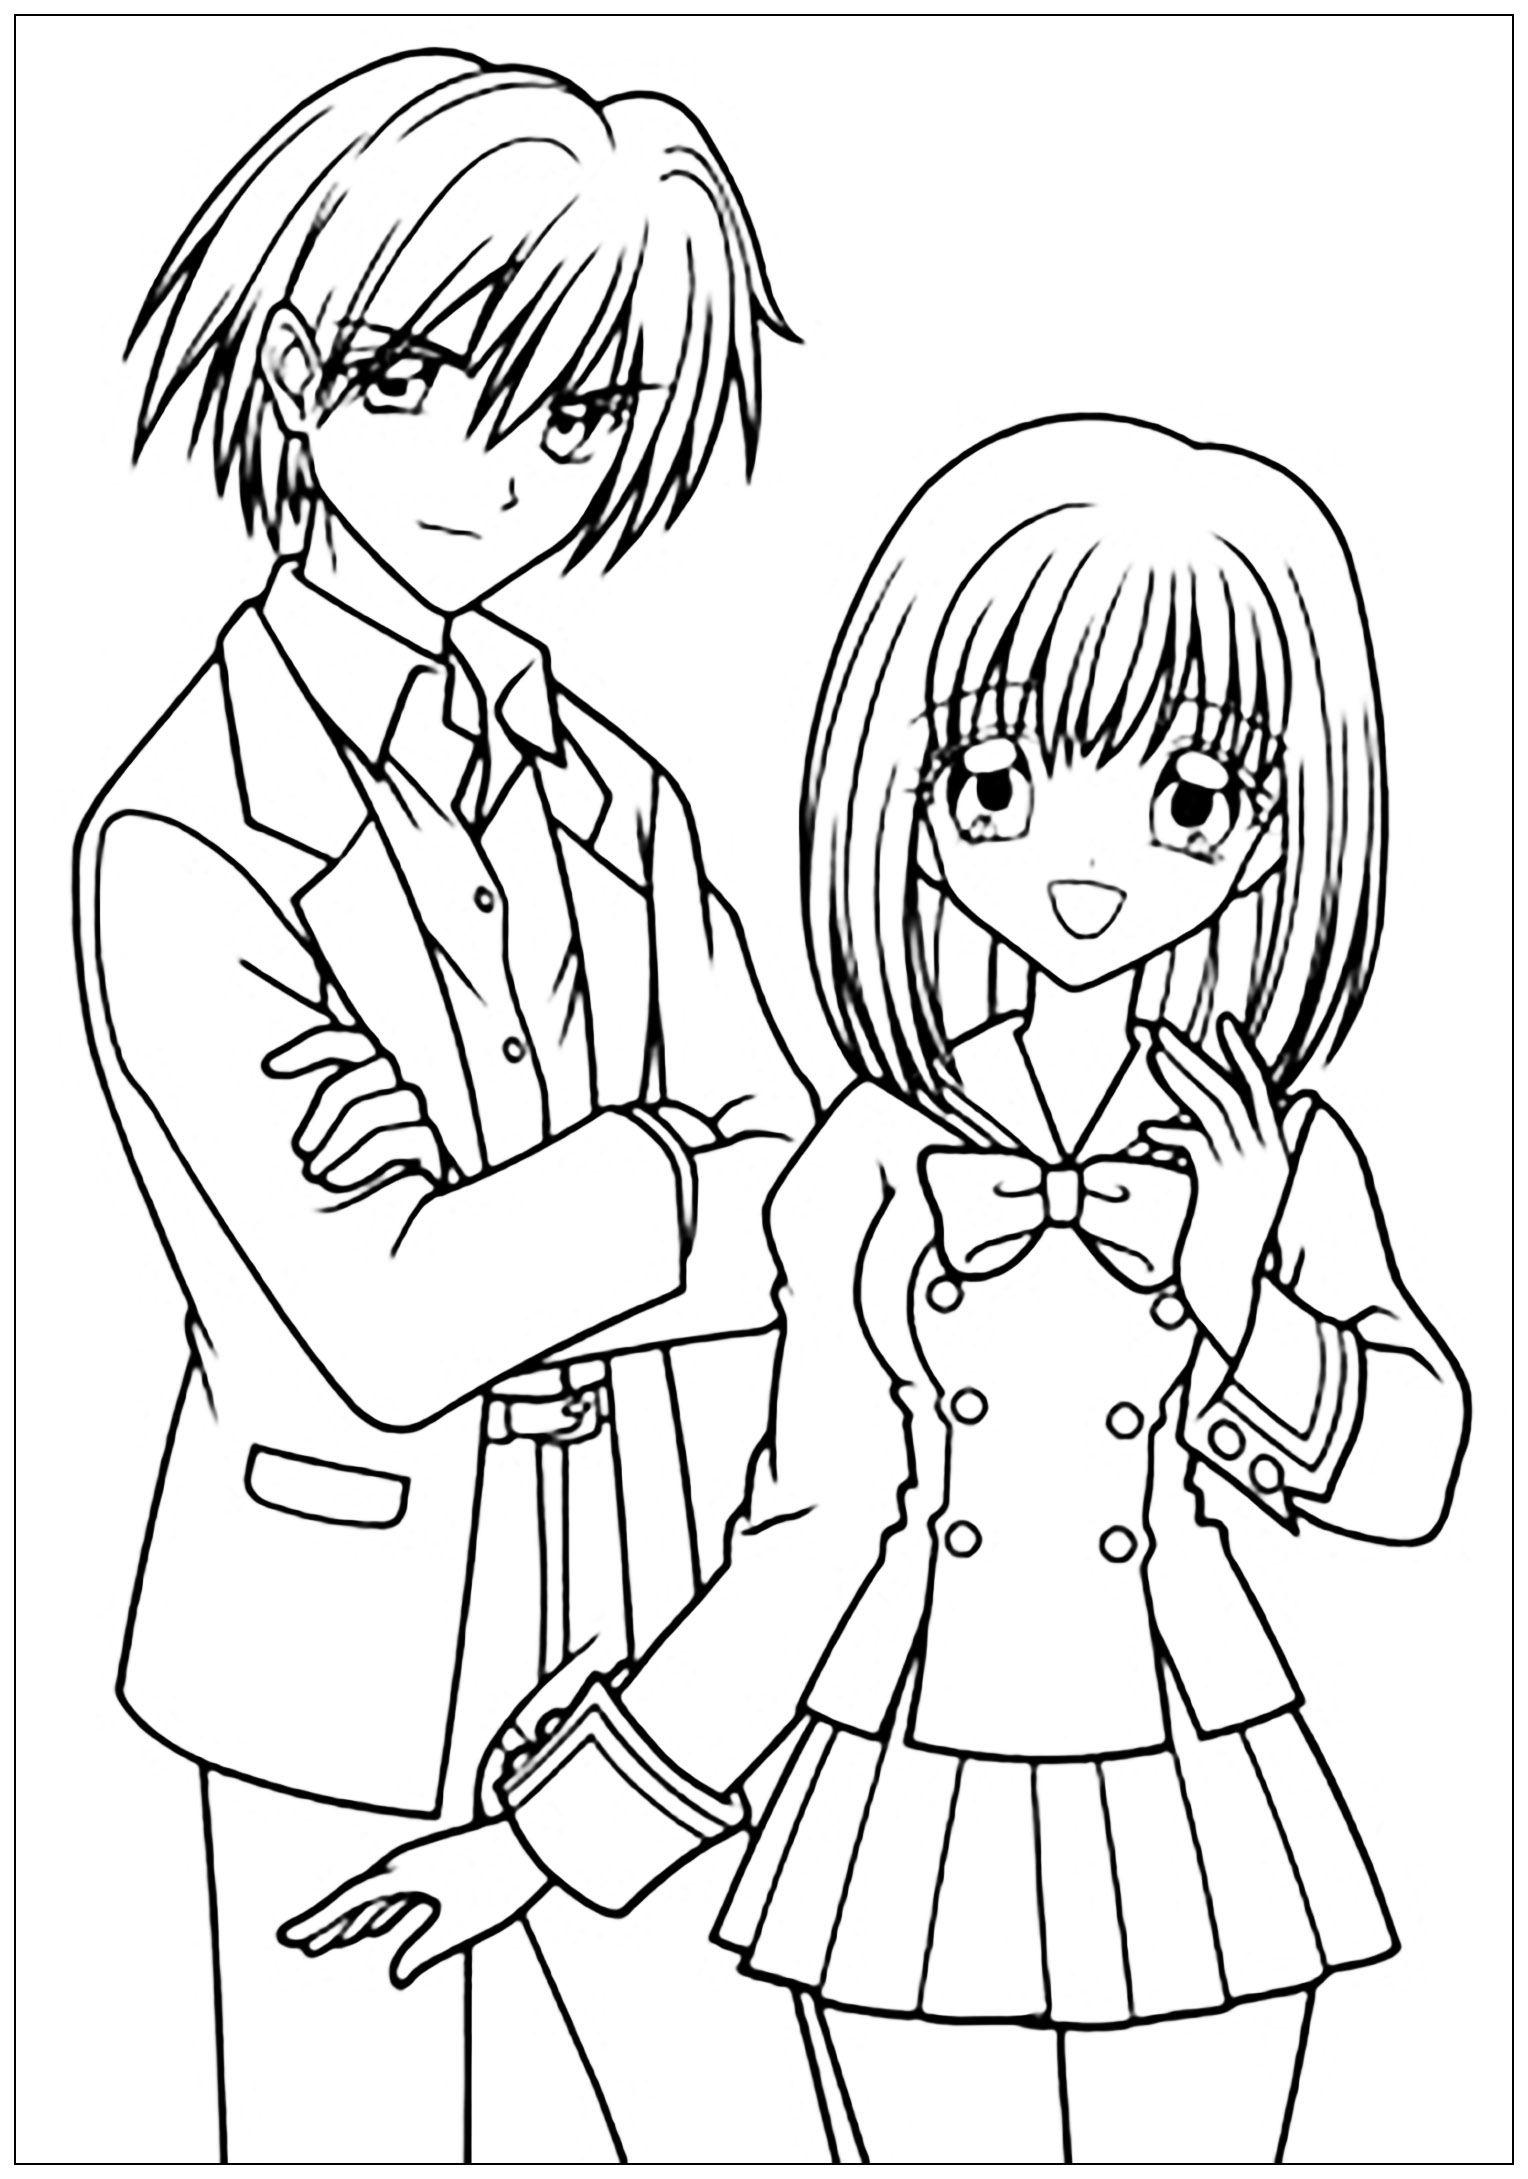 Dessin Manga A Colorier